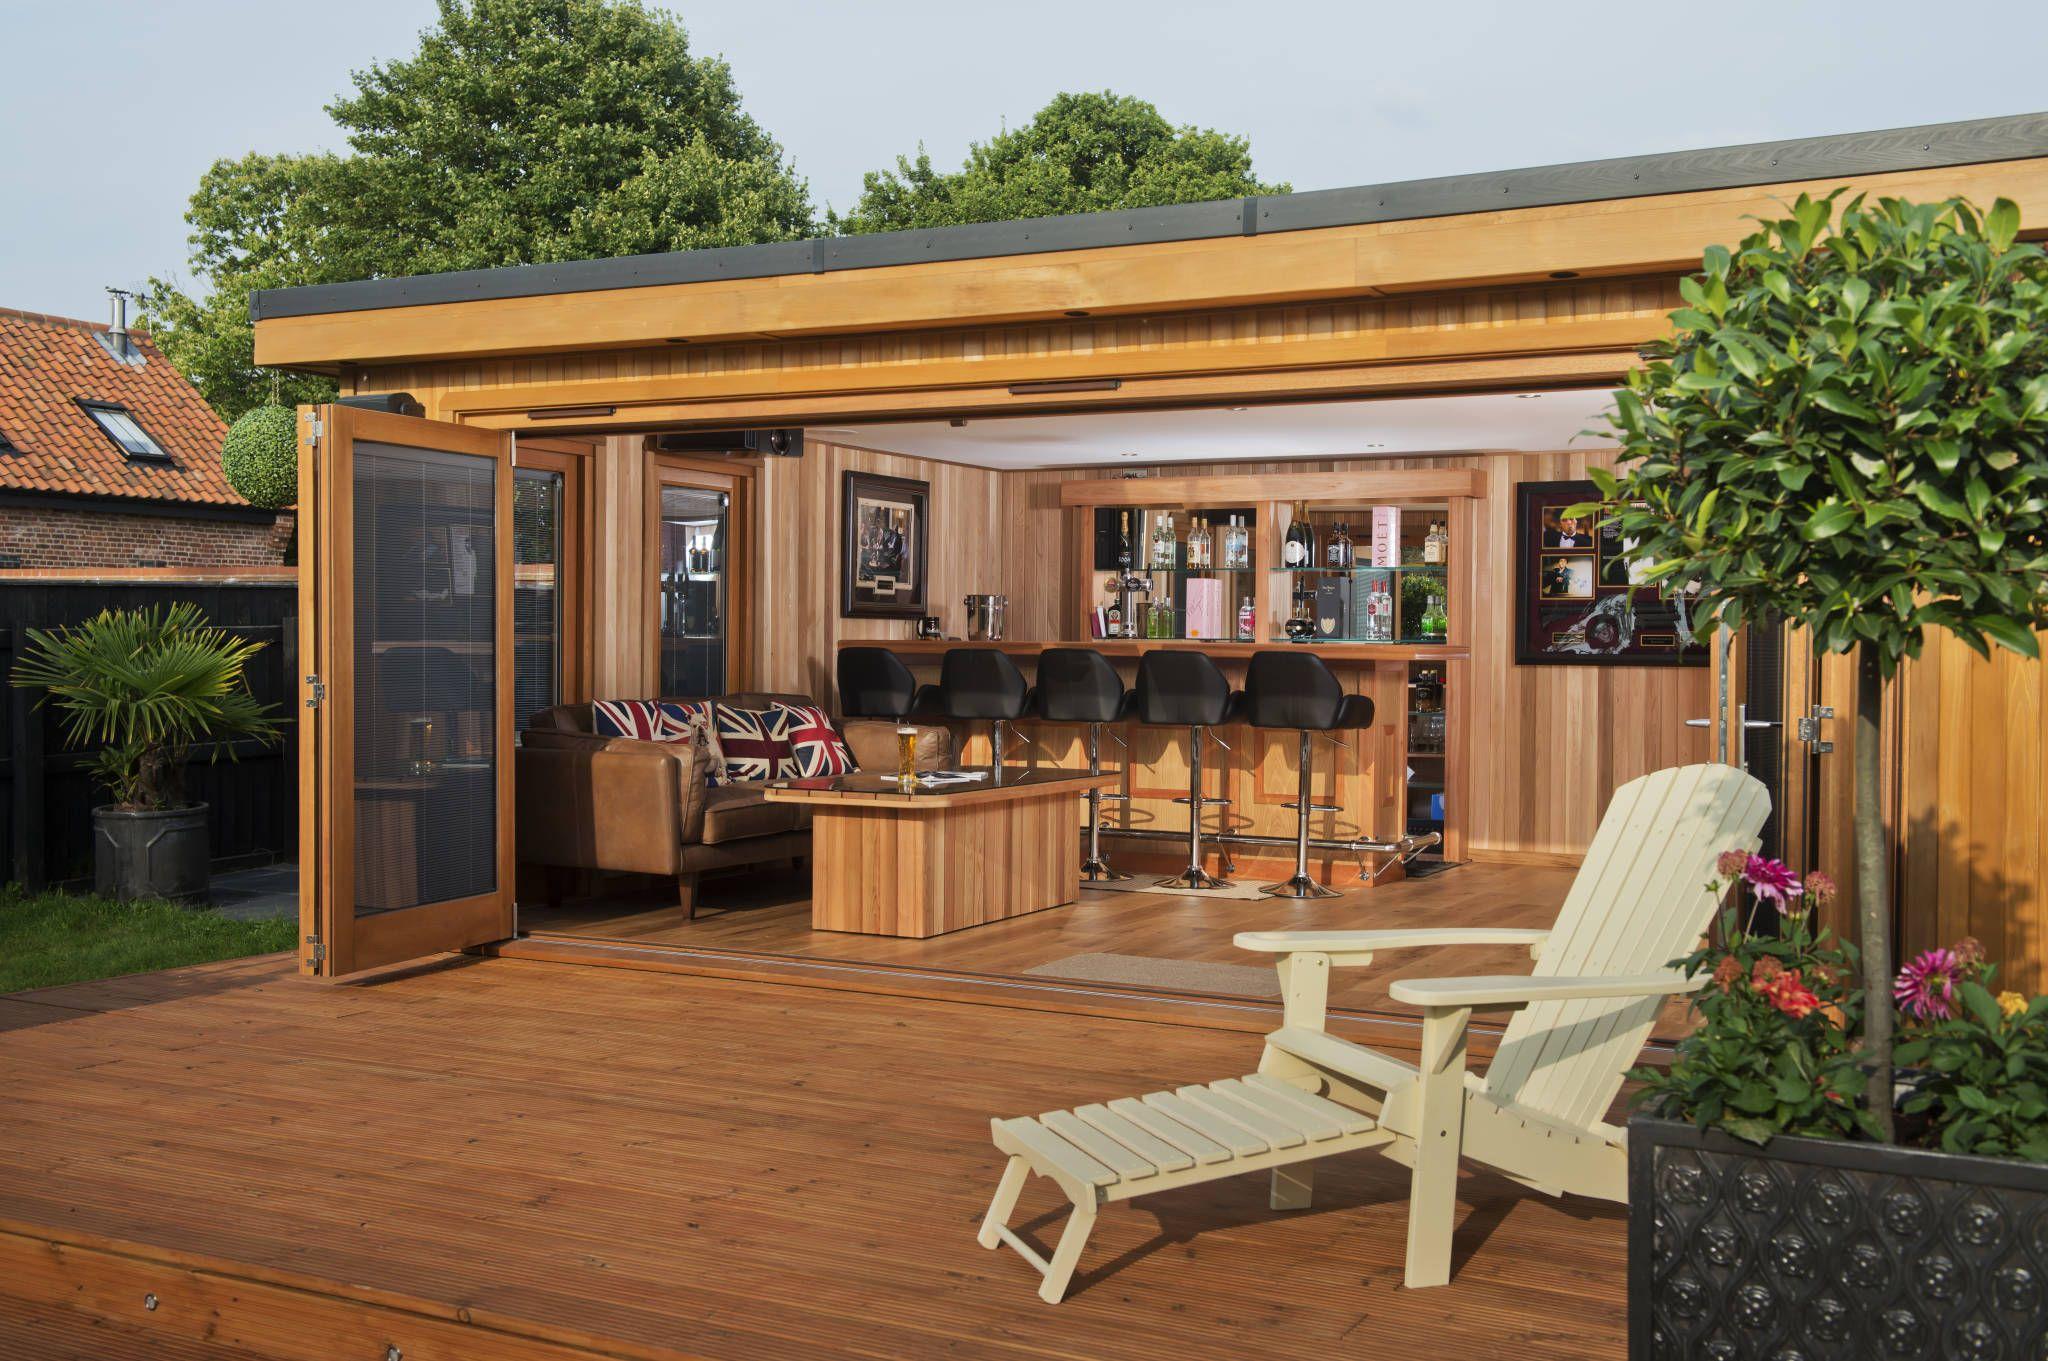 Pin On Architecture Ideas Designs Modern garden ideas with bar